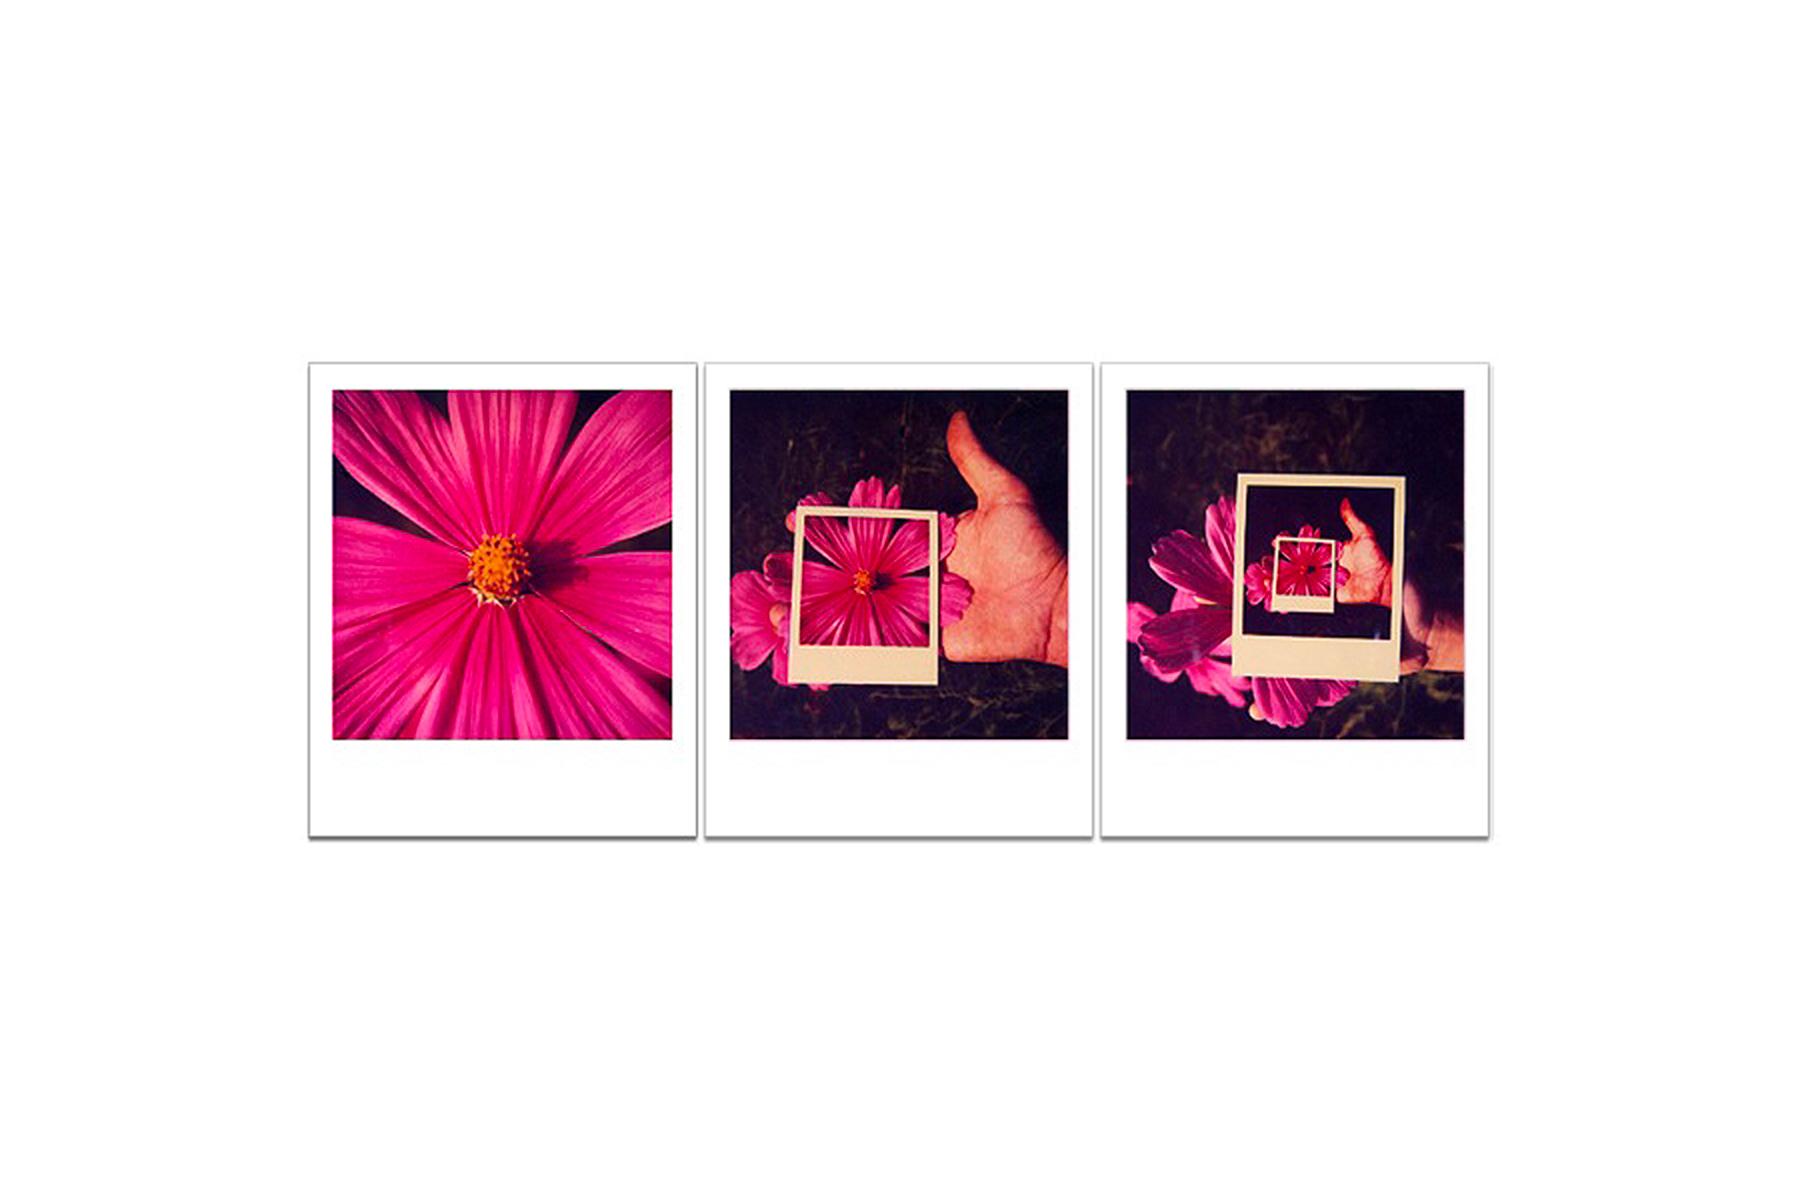 Passione Polaroid